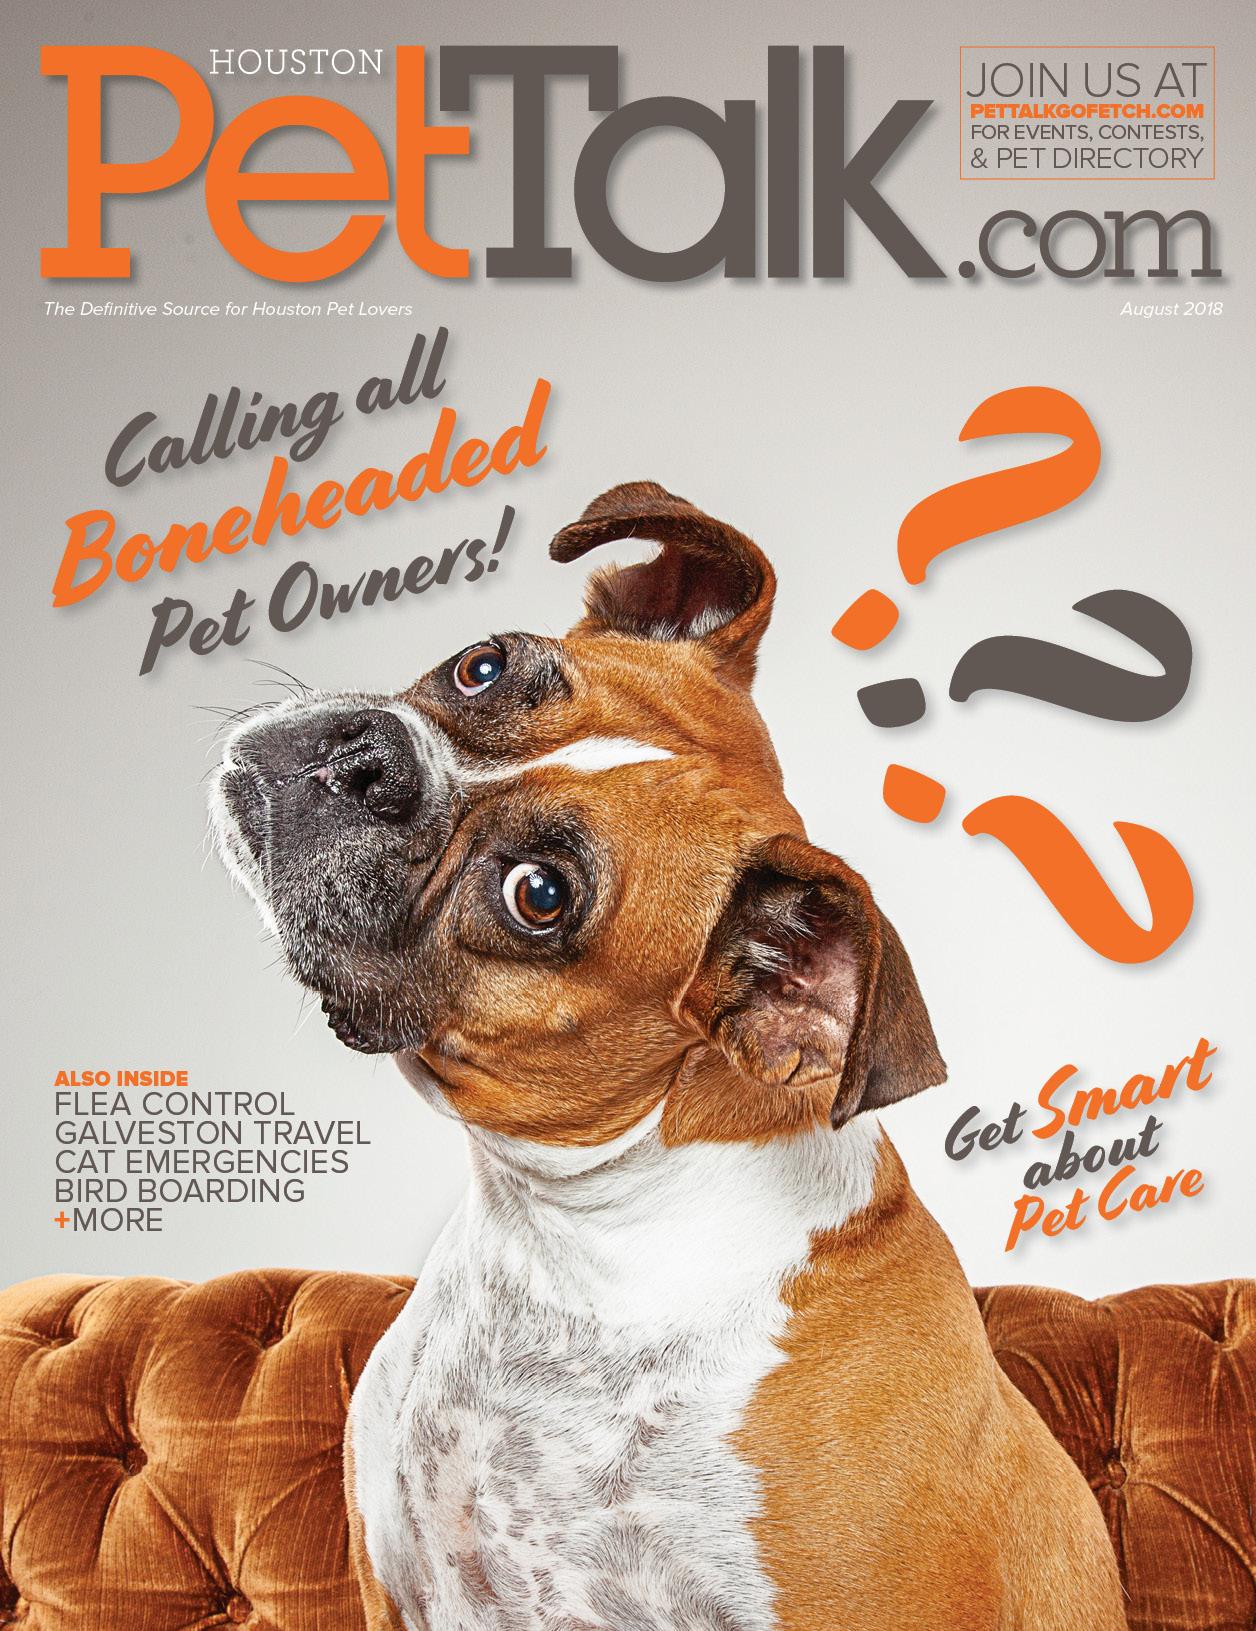 August 2018 Digital Issue of Houston PetTalk